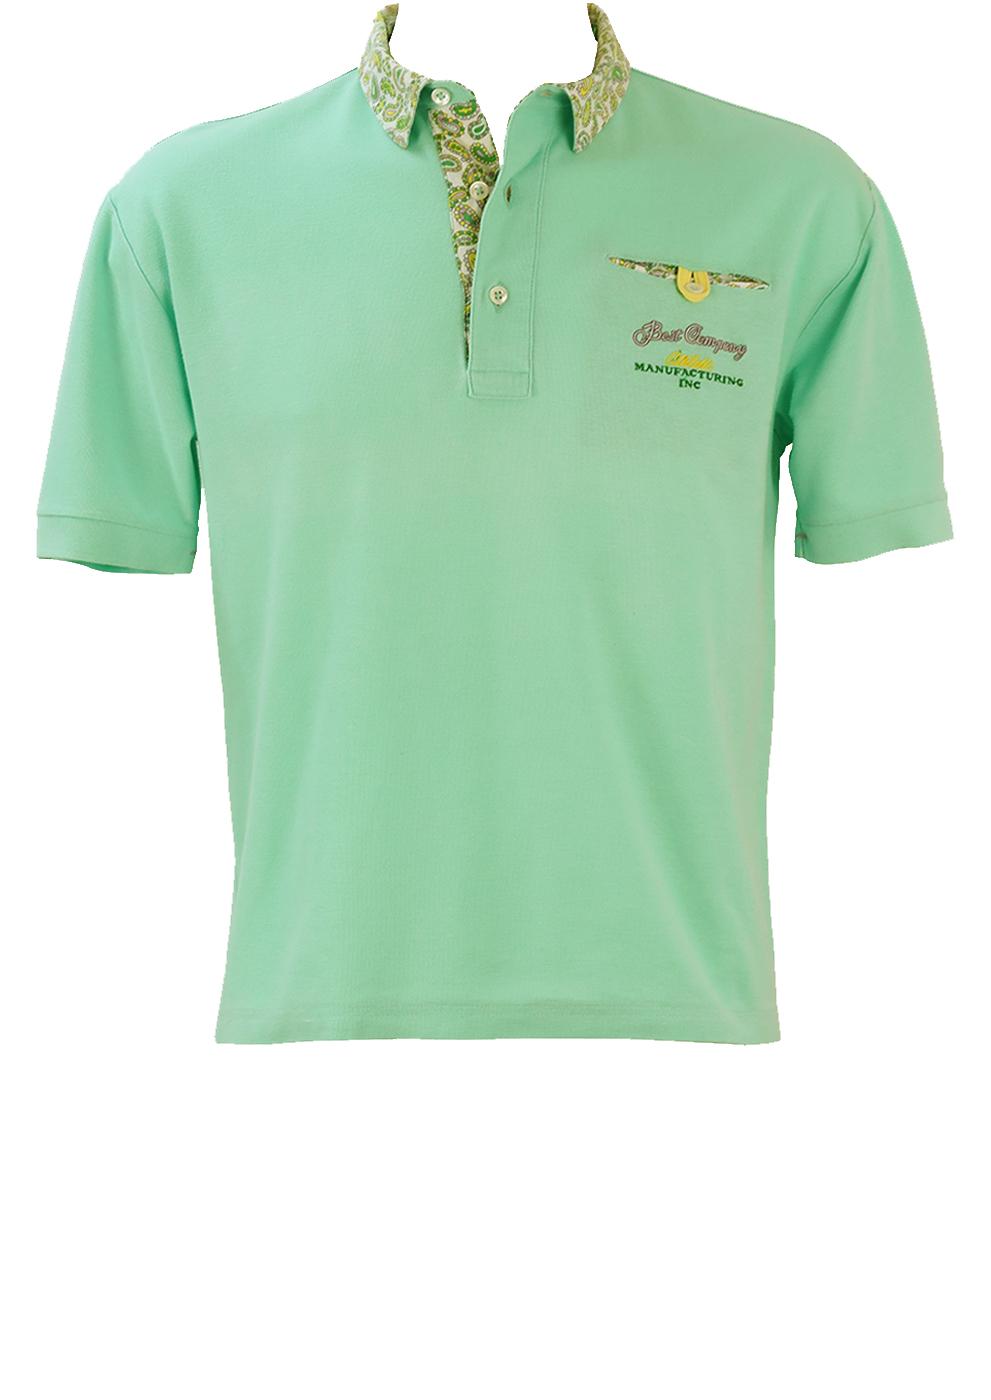 fbda4459 Olmes Carretti Best Company Light Blue Polo Shirt with Paisley Collar  Detail - M